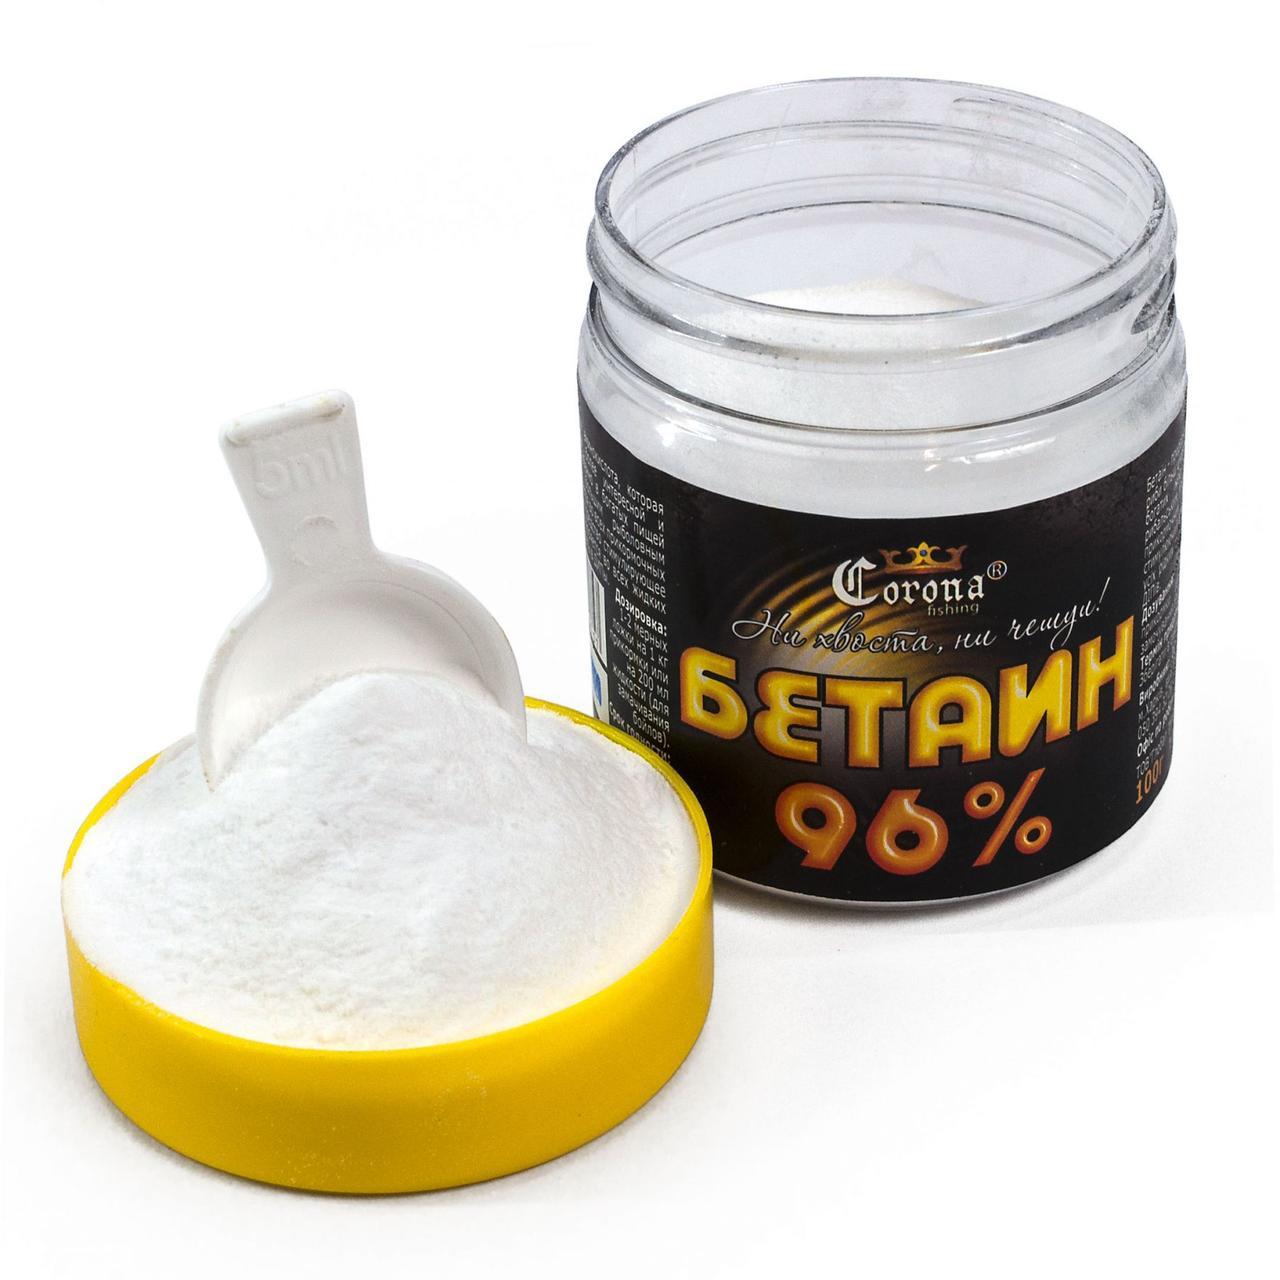 Бетаин - активатор клева 100г